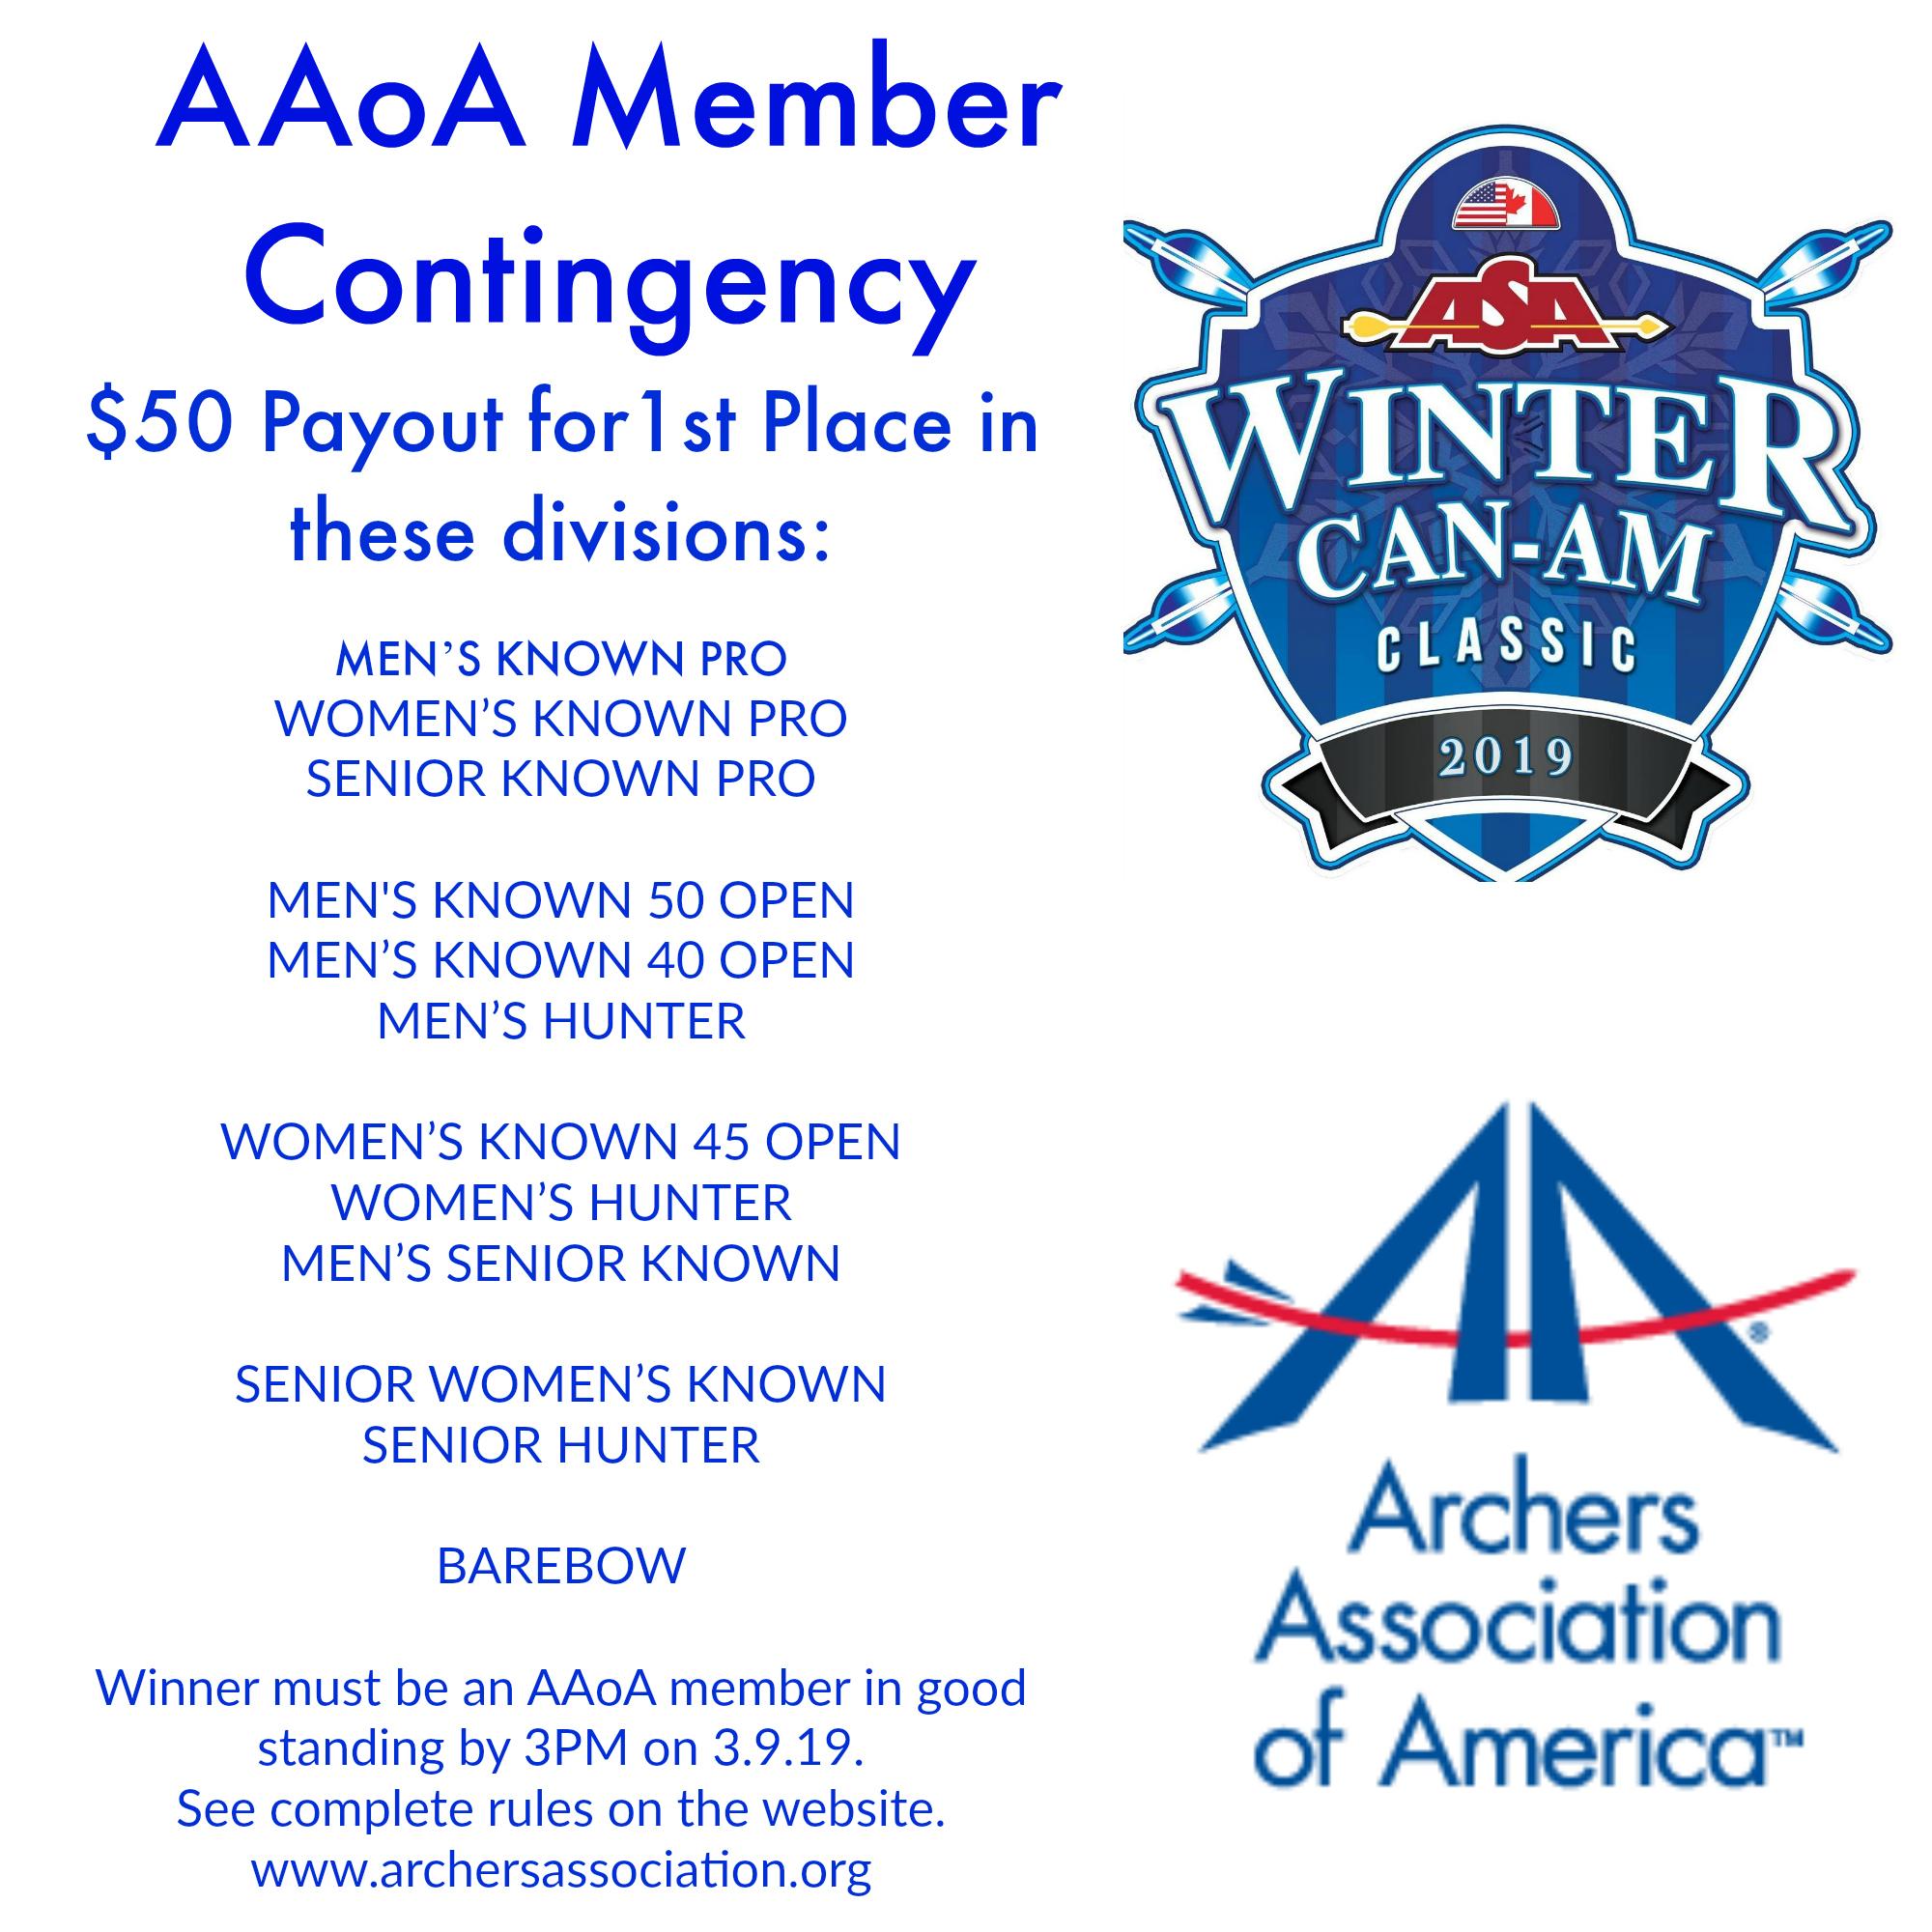 asa-archery-wintercanamclassictext2.jpg